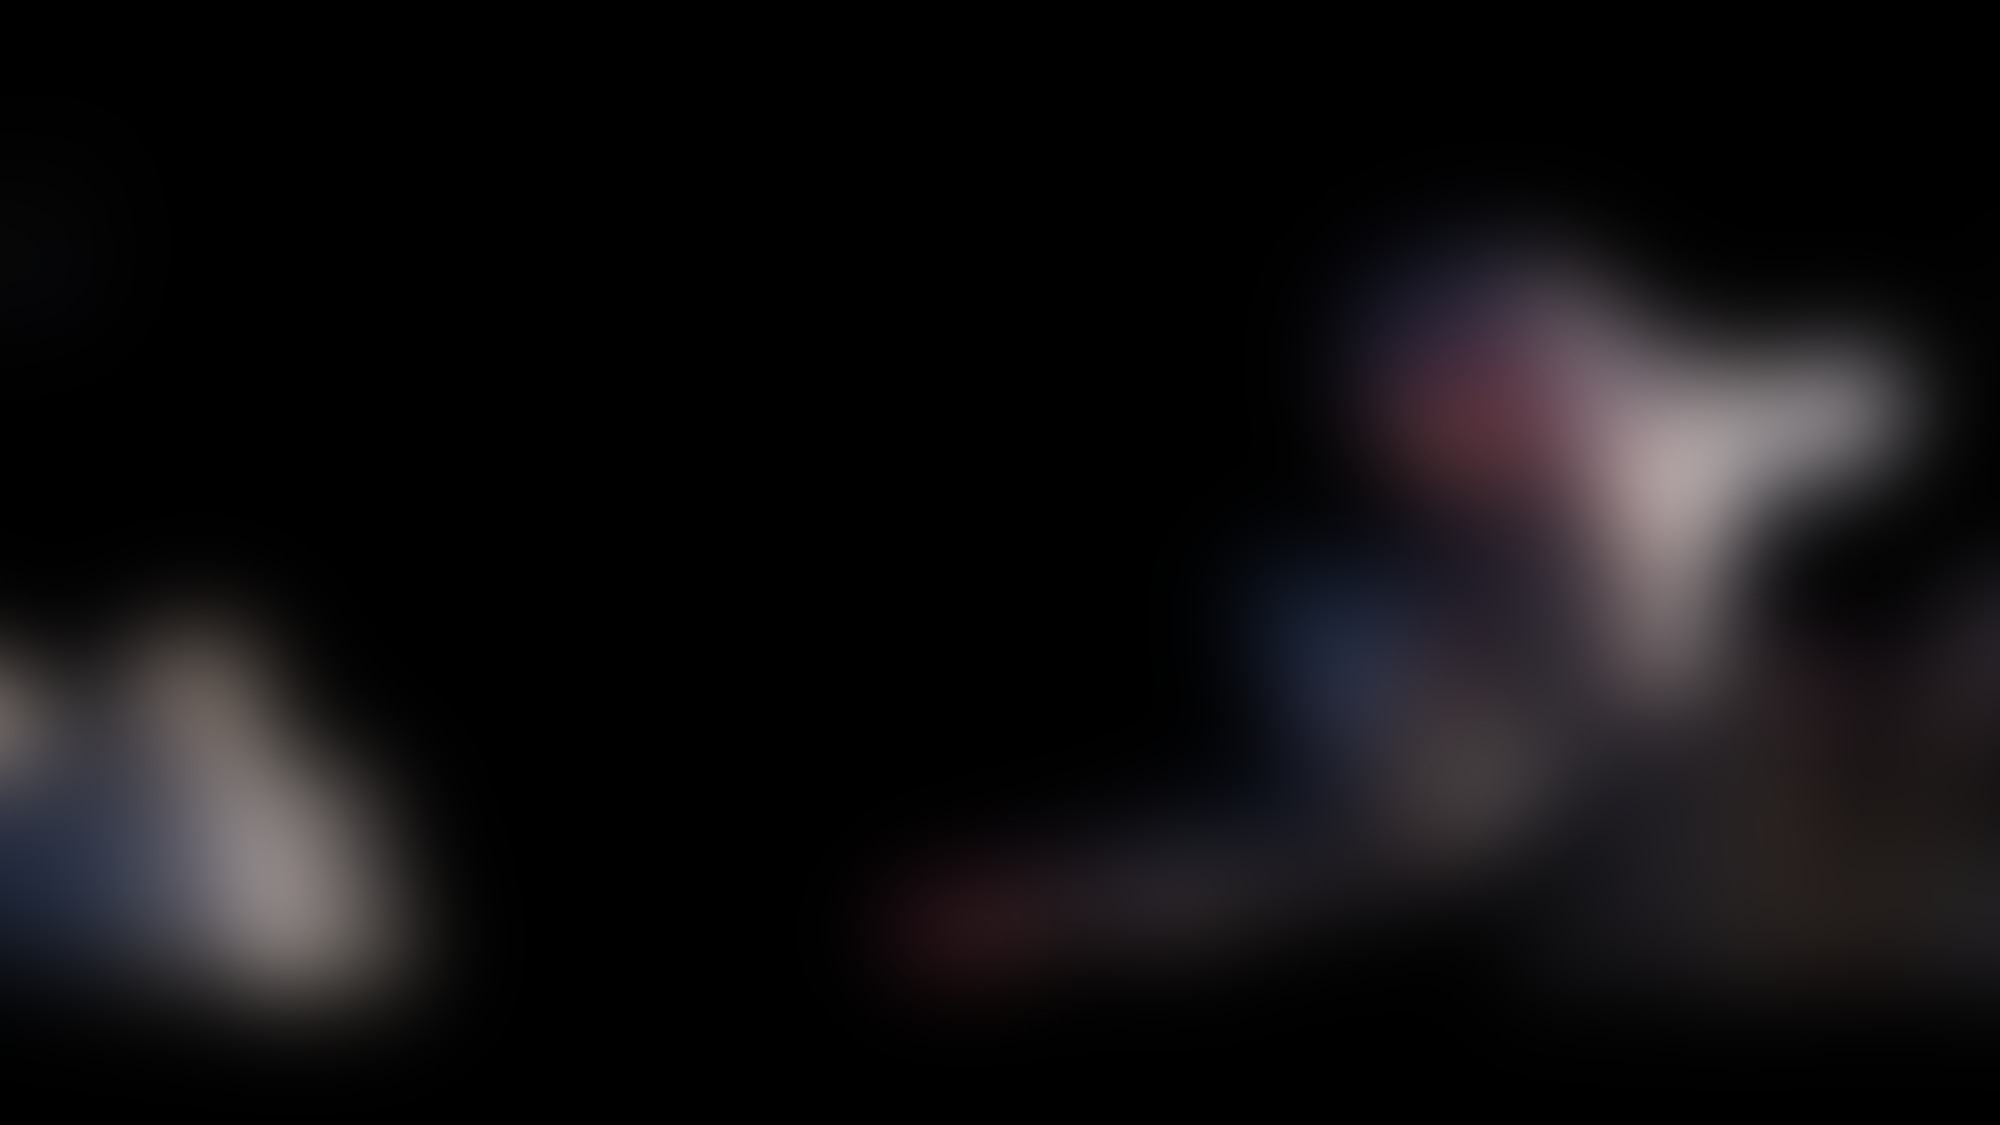 Avengers Infinity War2018 Framestore 02 before autocompressfitresizeixlibphp 1 1 0max h2000max w3 D2000q80s47821342322ff0b2e7225bc4395155d4